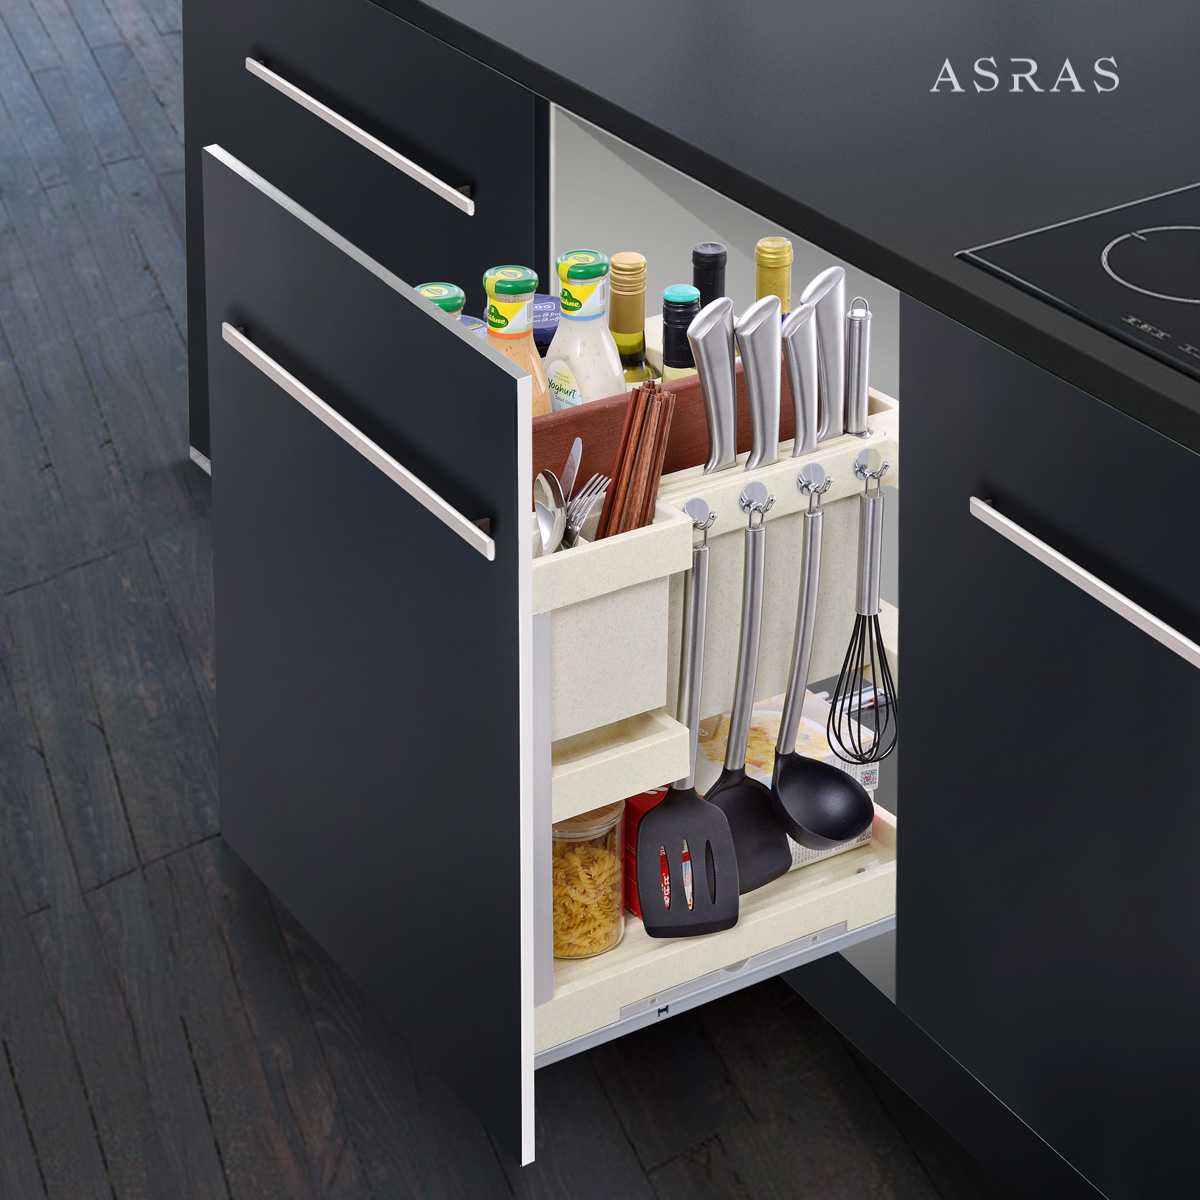 kitchen cabinets okc tile 橱柜配件用件新品 橱柜配件用件价格 橱柜配件用件包邮 品牌 淘宝海外 厨柜okc